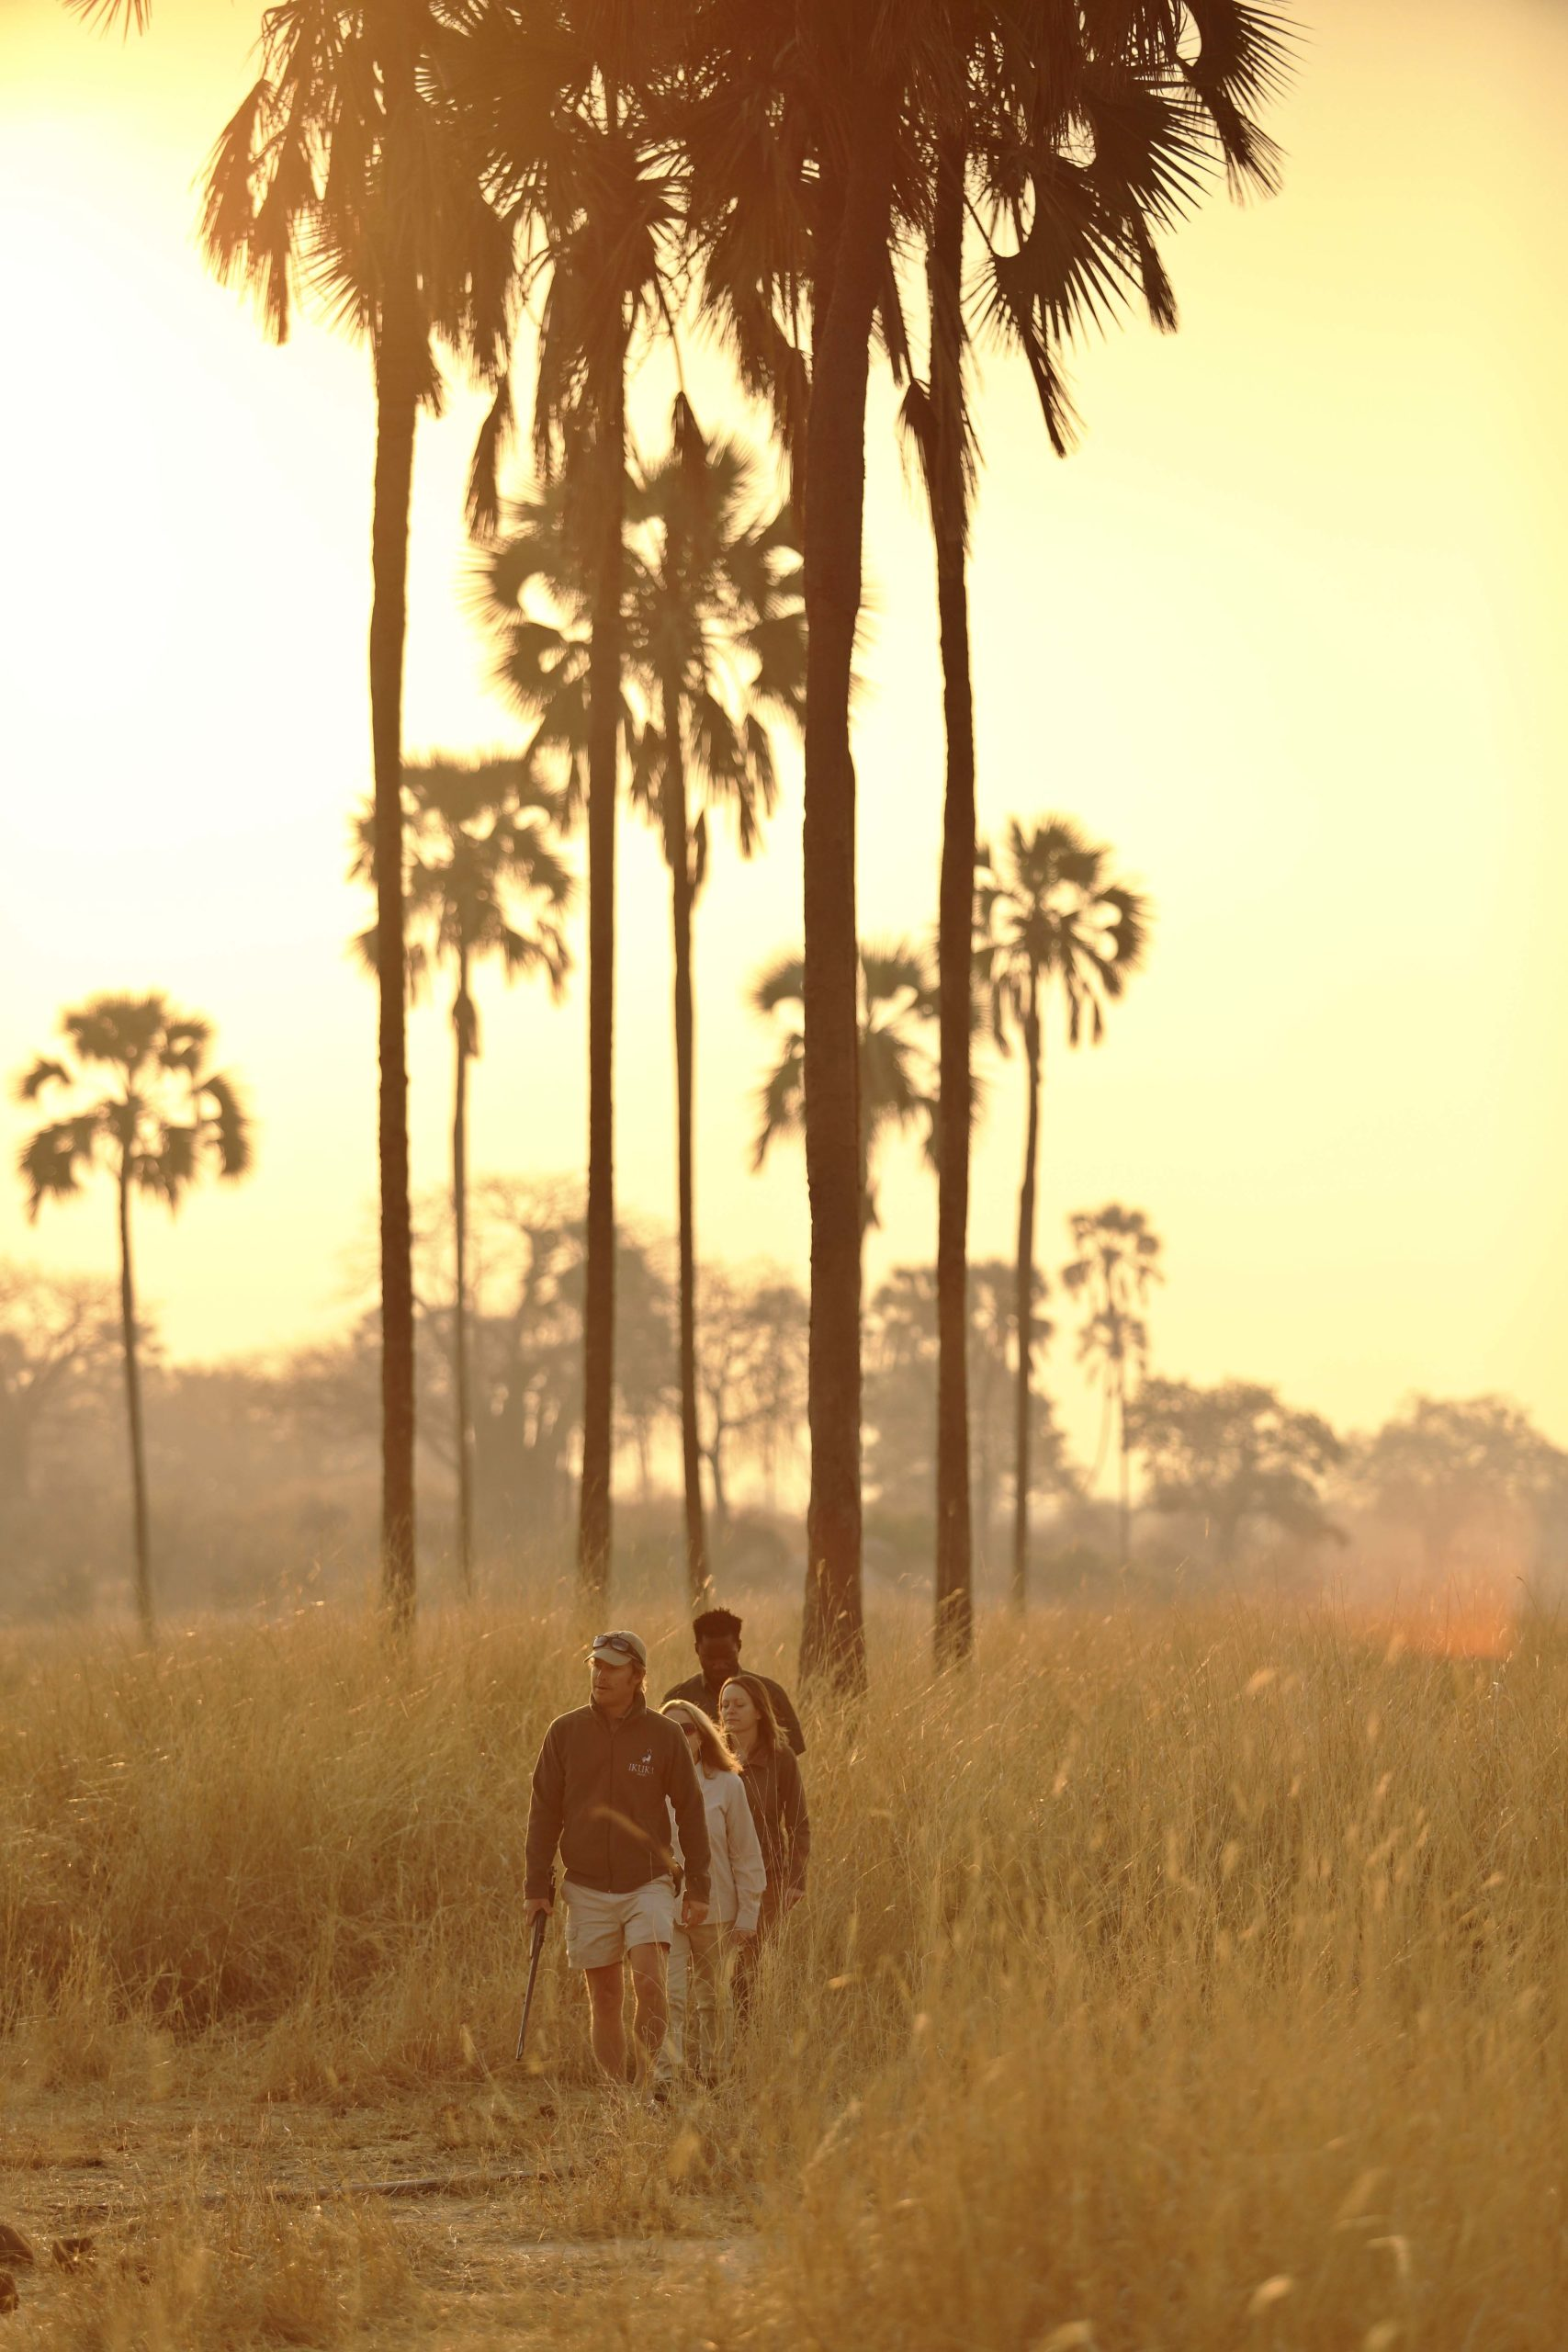 walking safari through the golden grass and palm trees at sunset in Ruaha on Tanzania safari